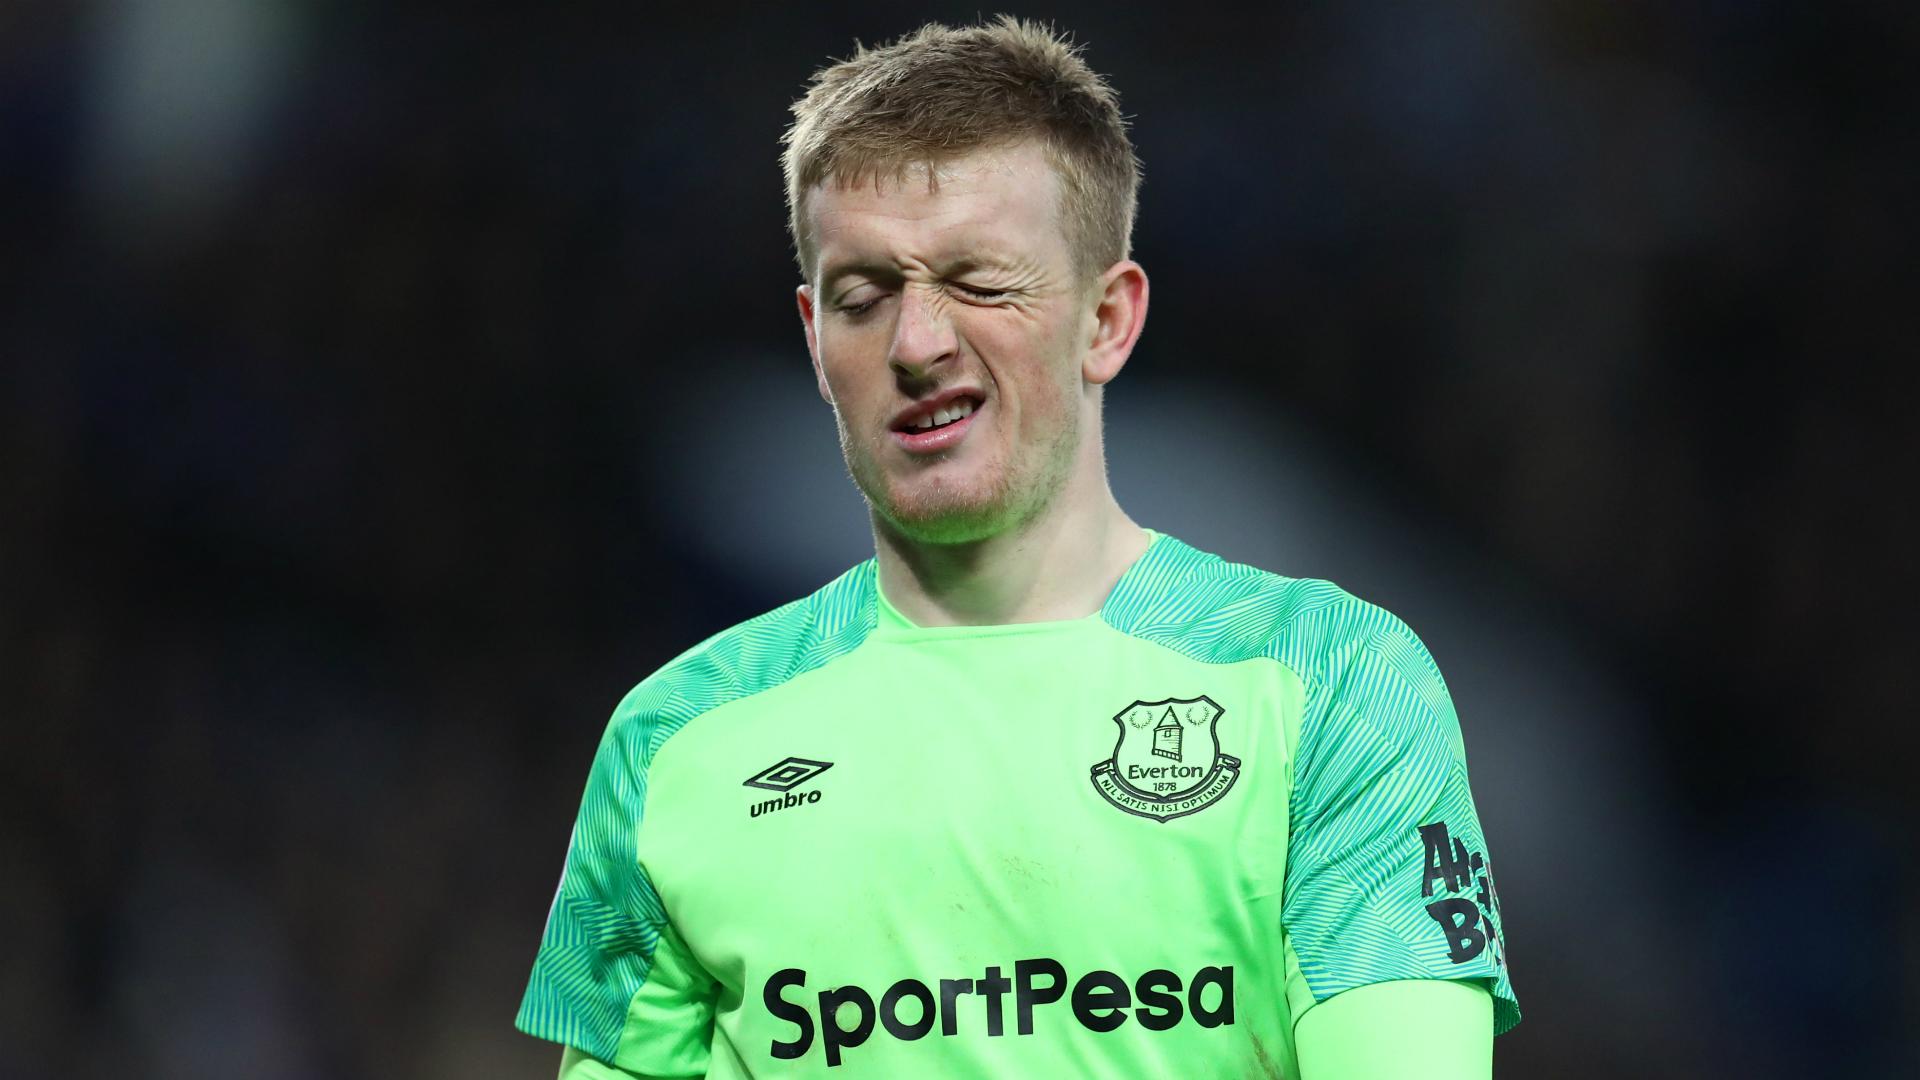 Pickford defends form amid scrutiny over England spot